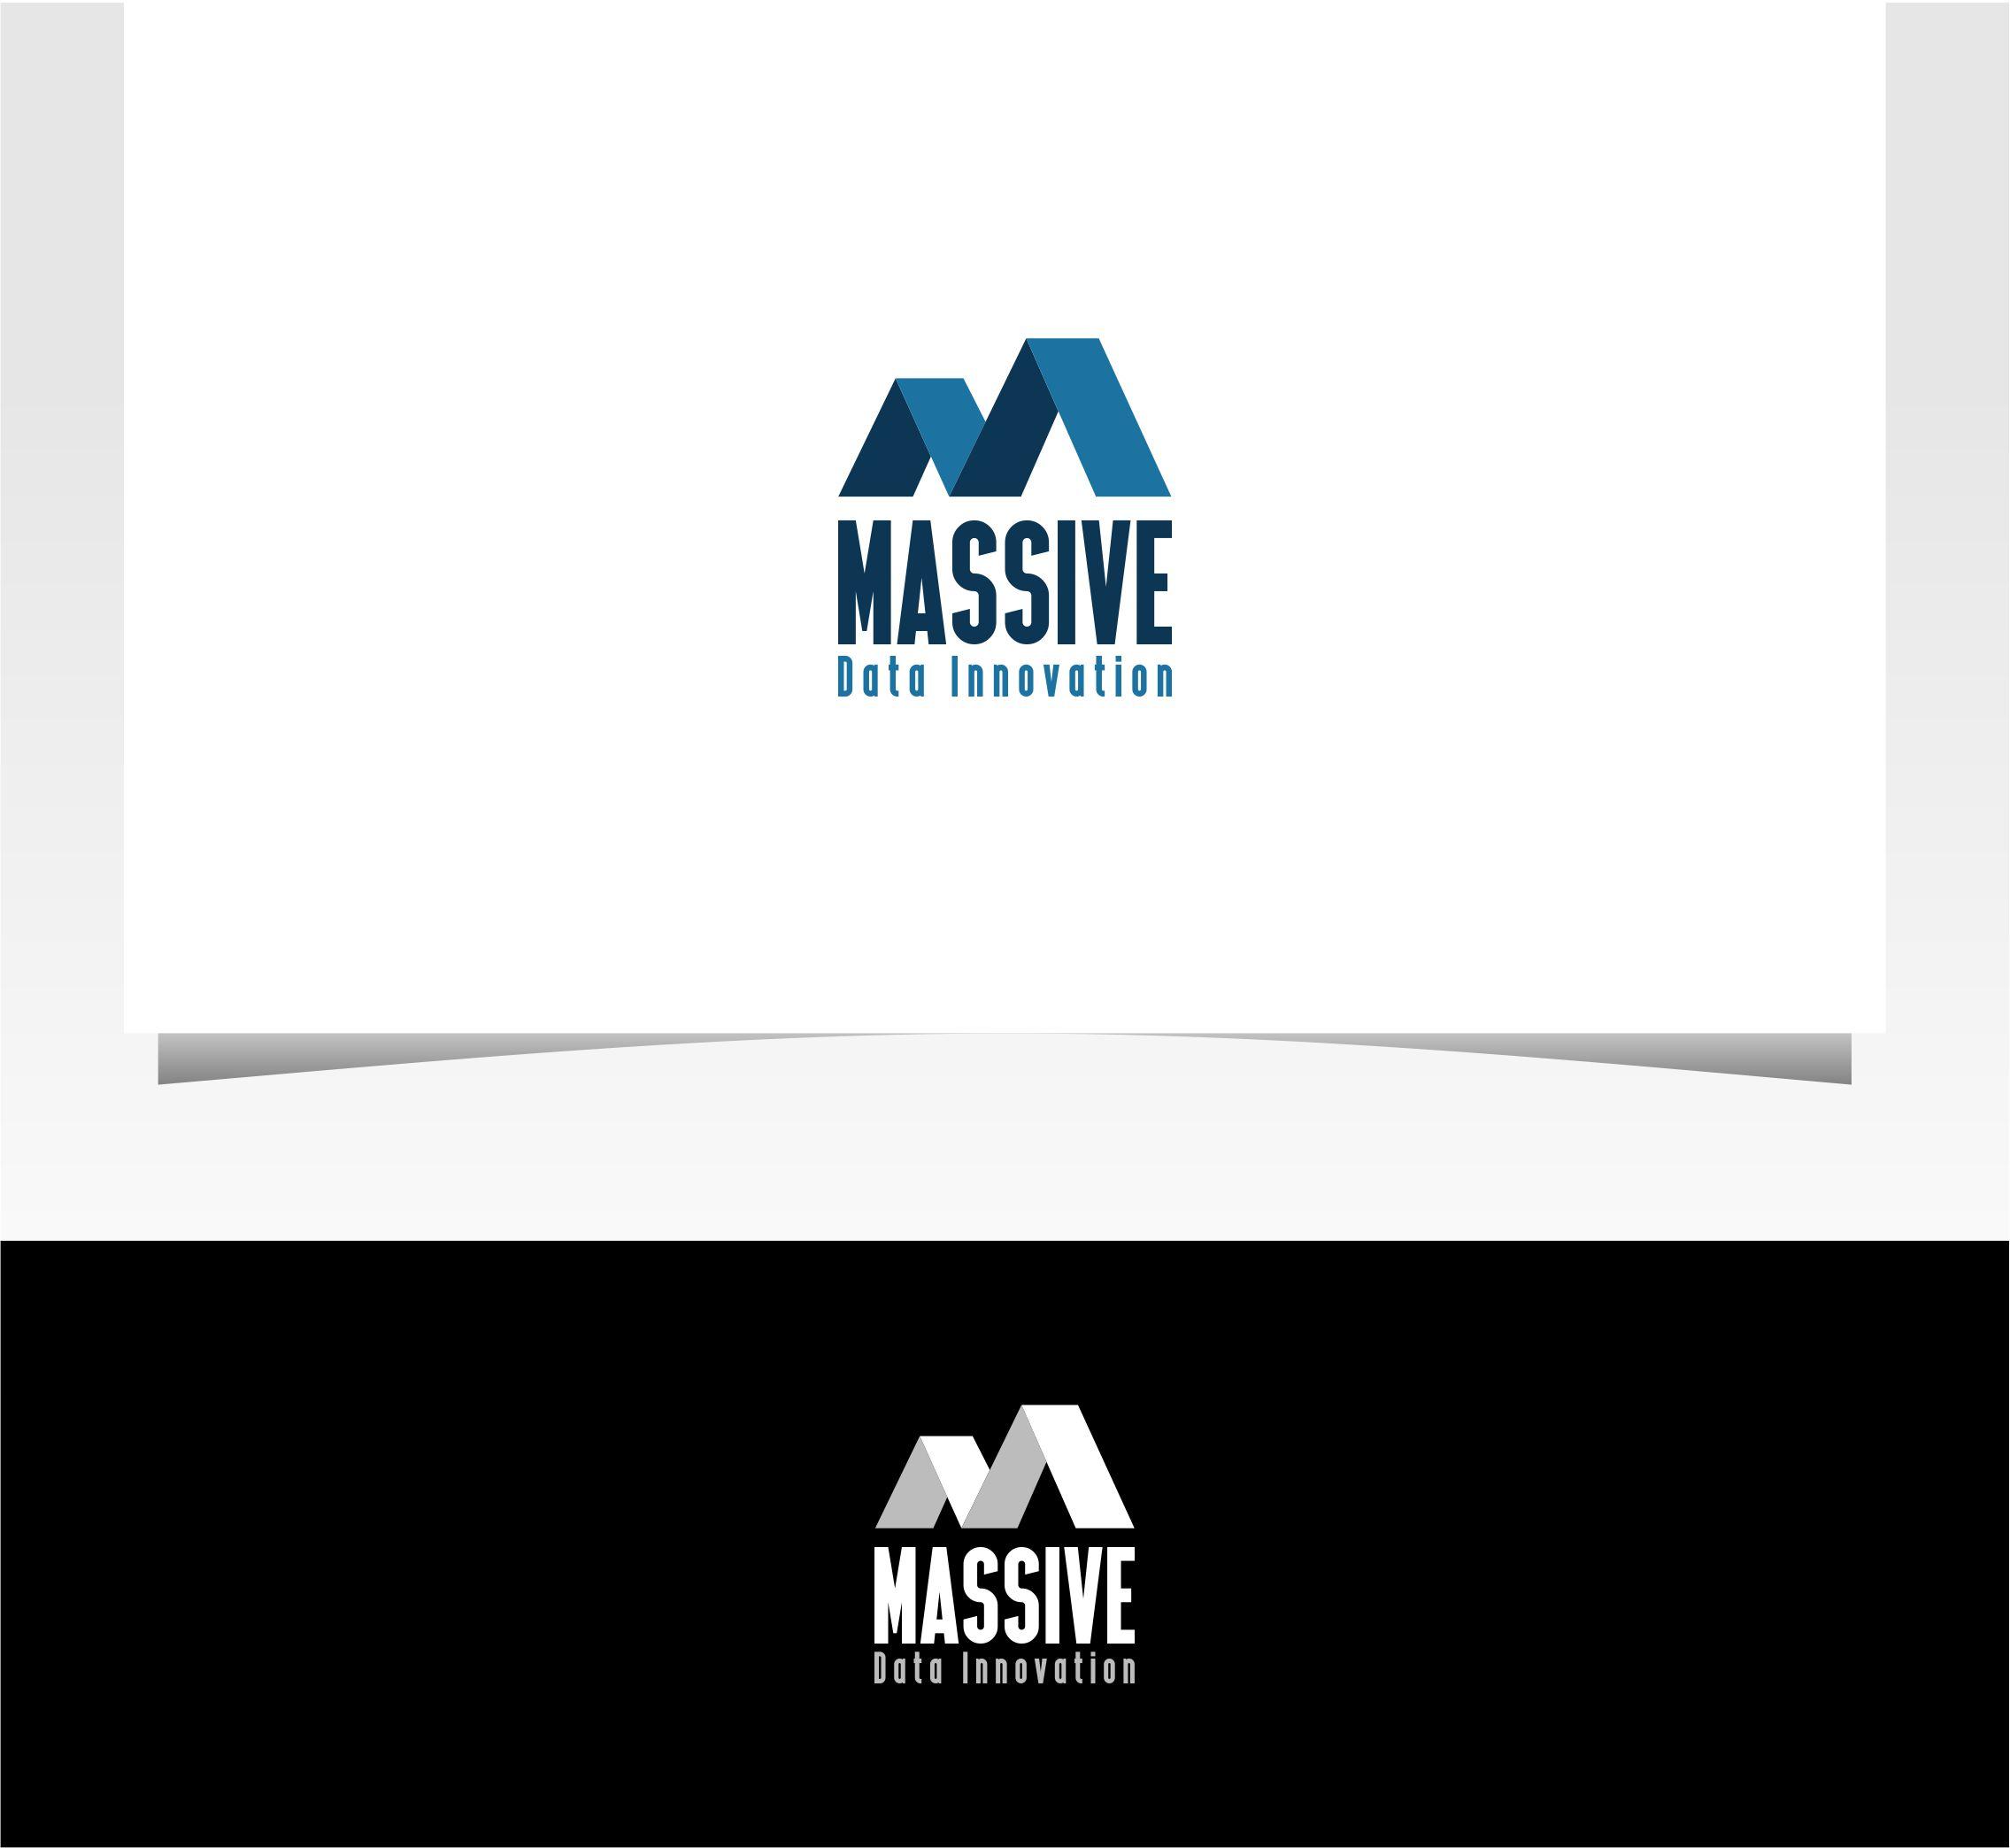 Logo Design by Raymond Garcia - Entry No. 68 in the Logo Design Contest MASSIVE LOGO.